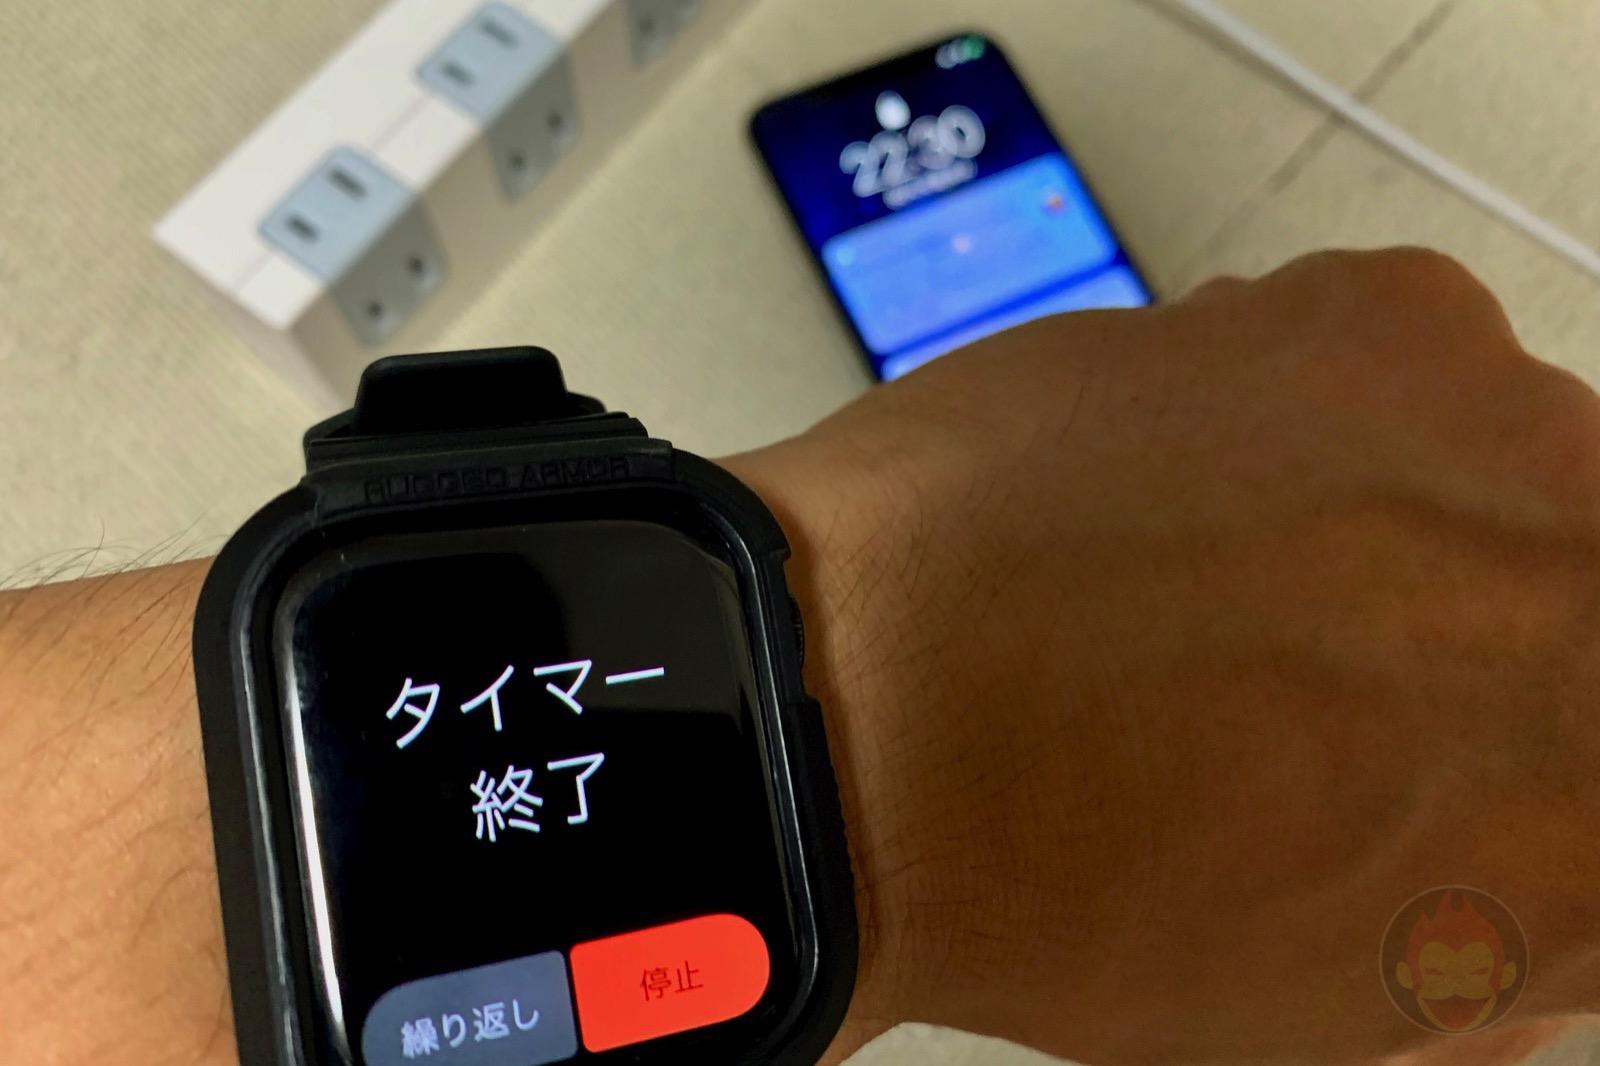 iphone-high-speed-charging-test-07.jpg